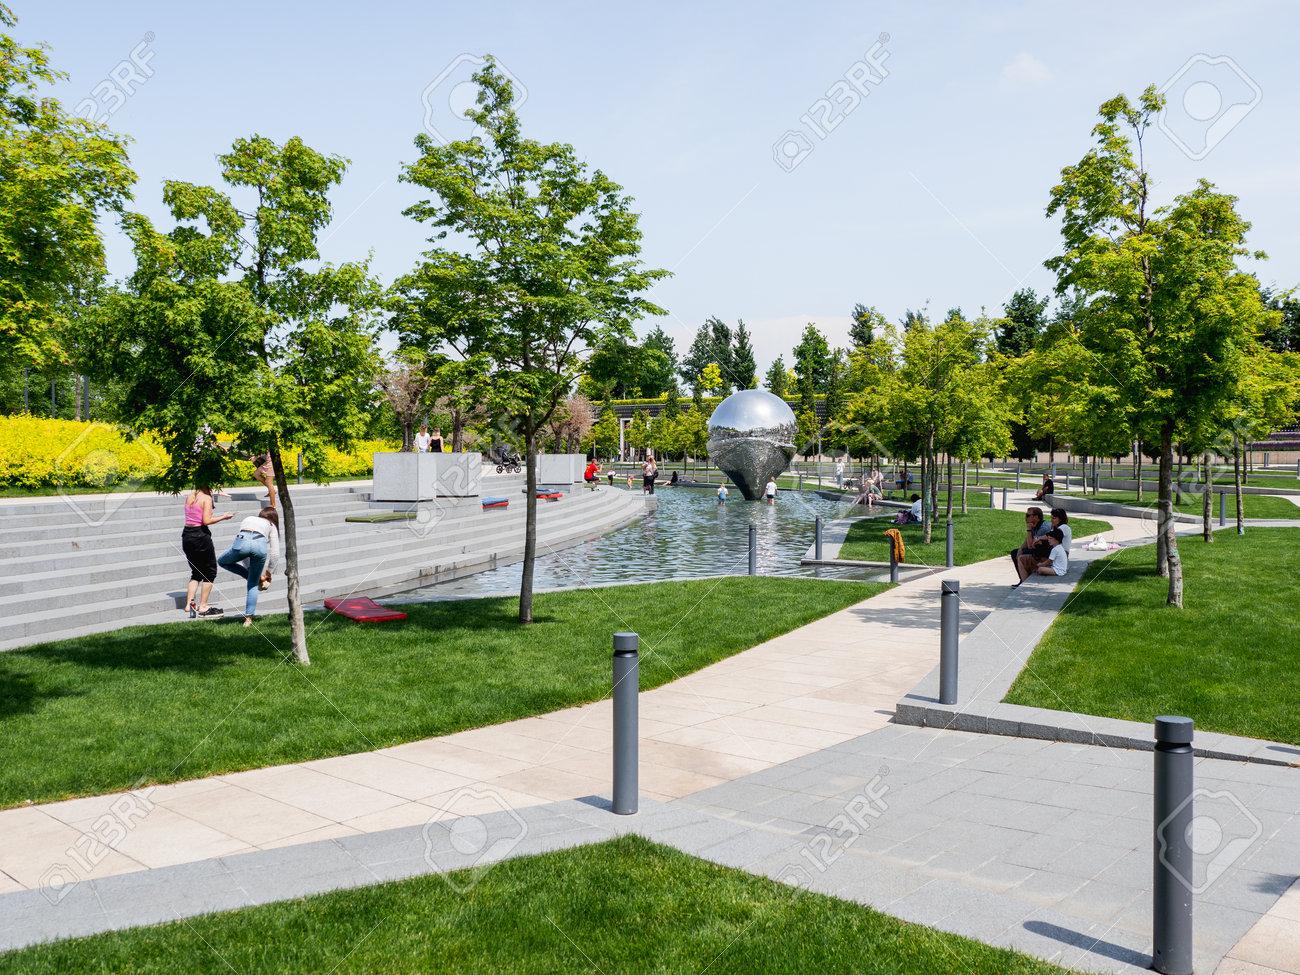 KRASNODAR, RUSSIA - June 01, 2021. People relaxes near fountains and lawns in famous Krasnodar urban park. - 173017793